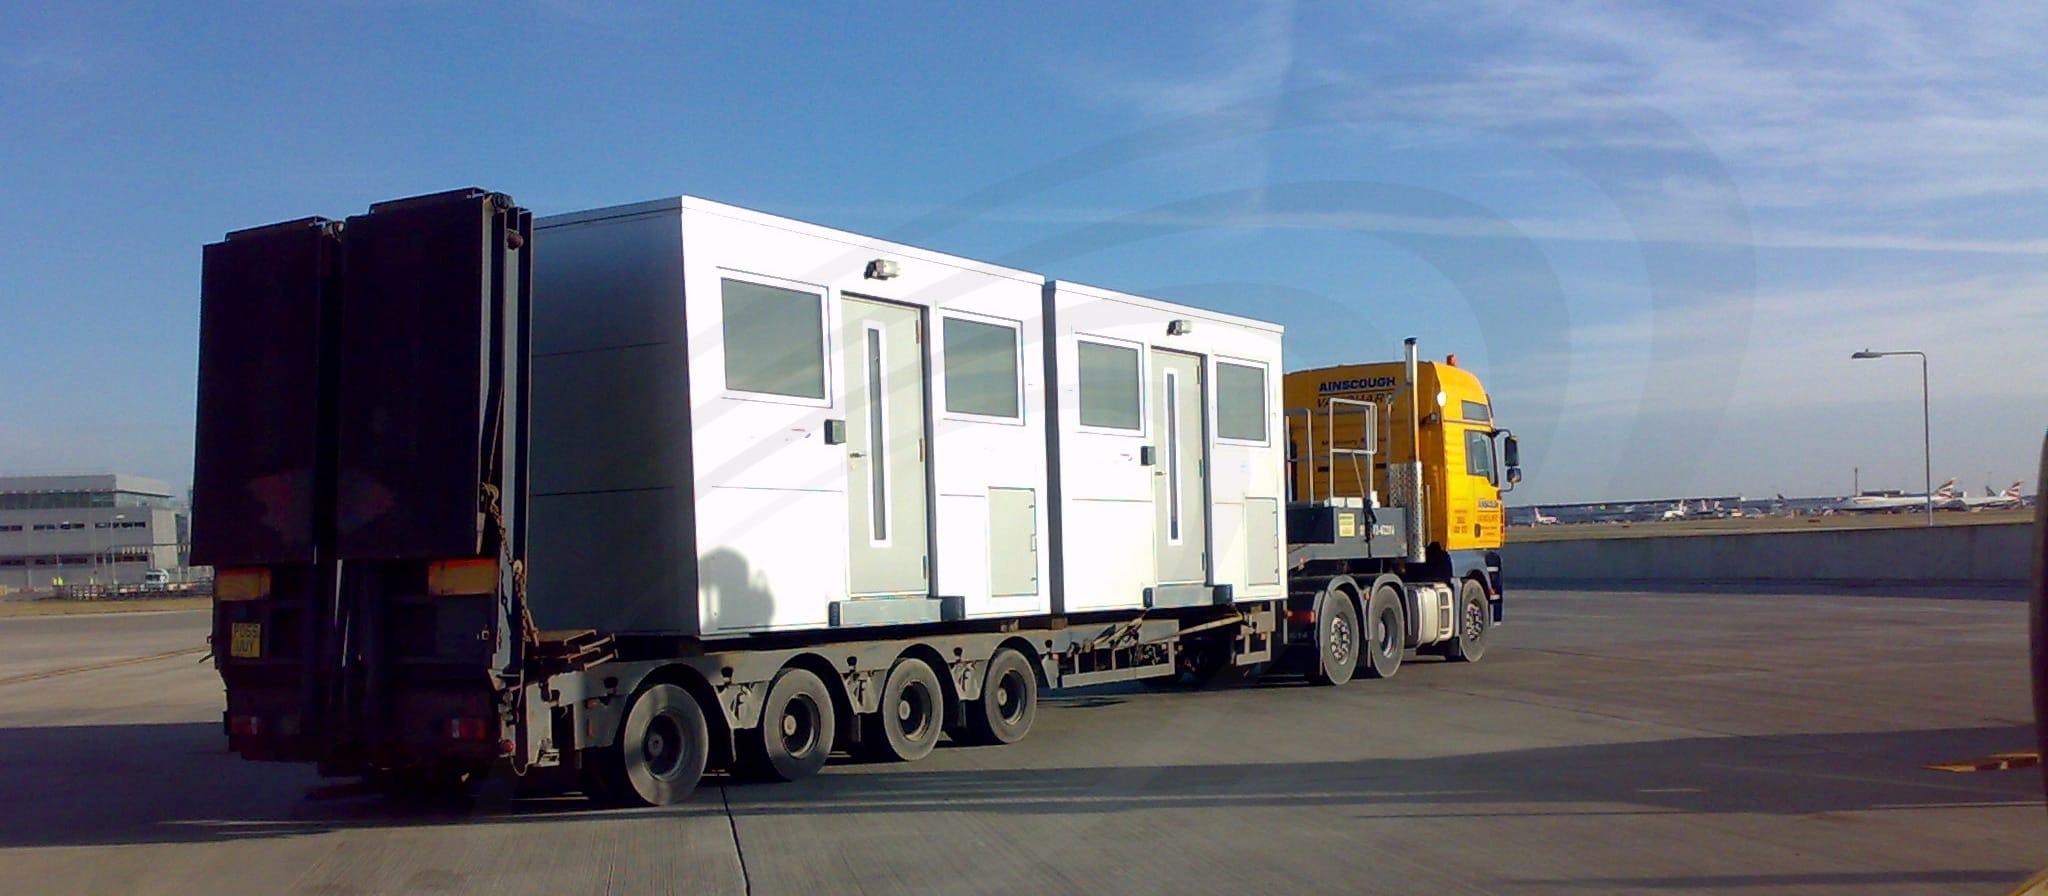 IAC Acoustics bespoke acoustic canpoy transportation